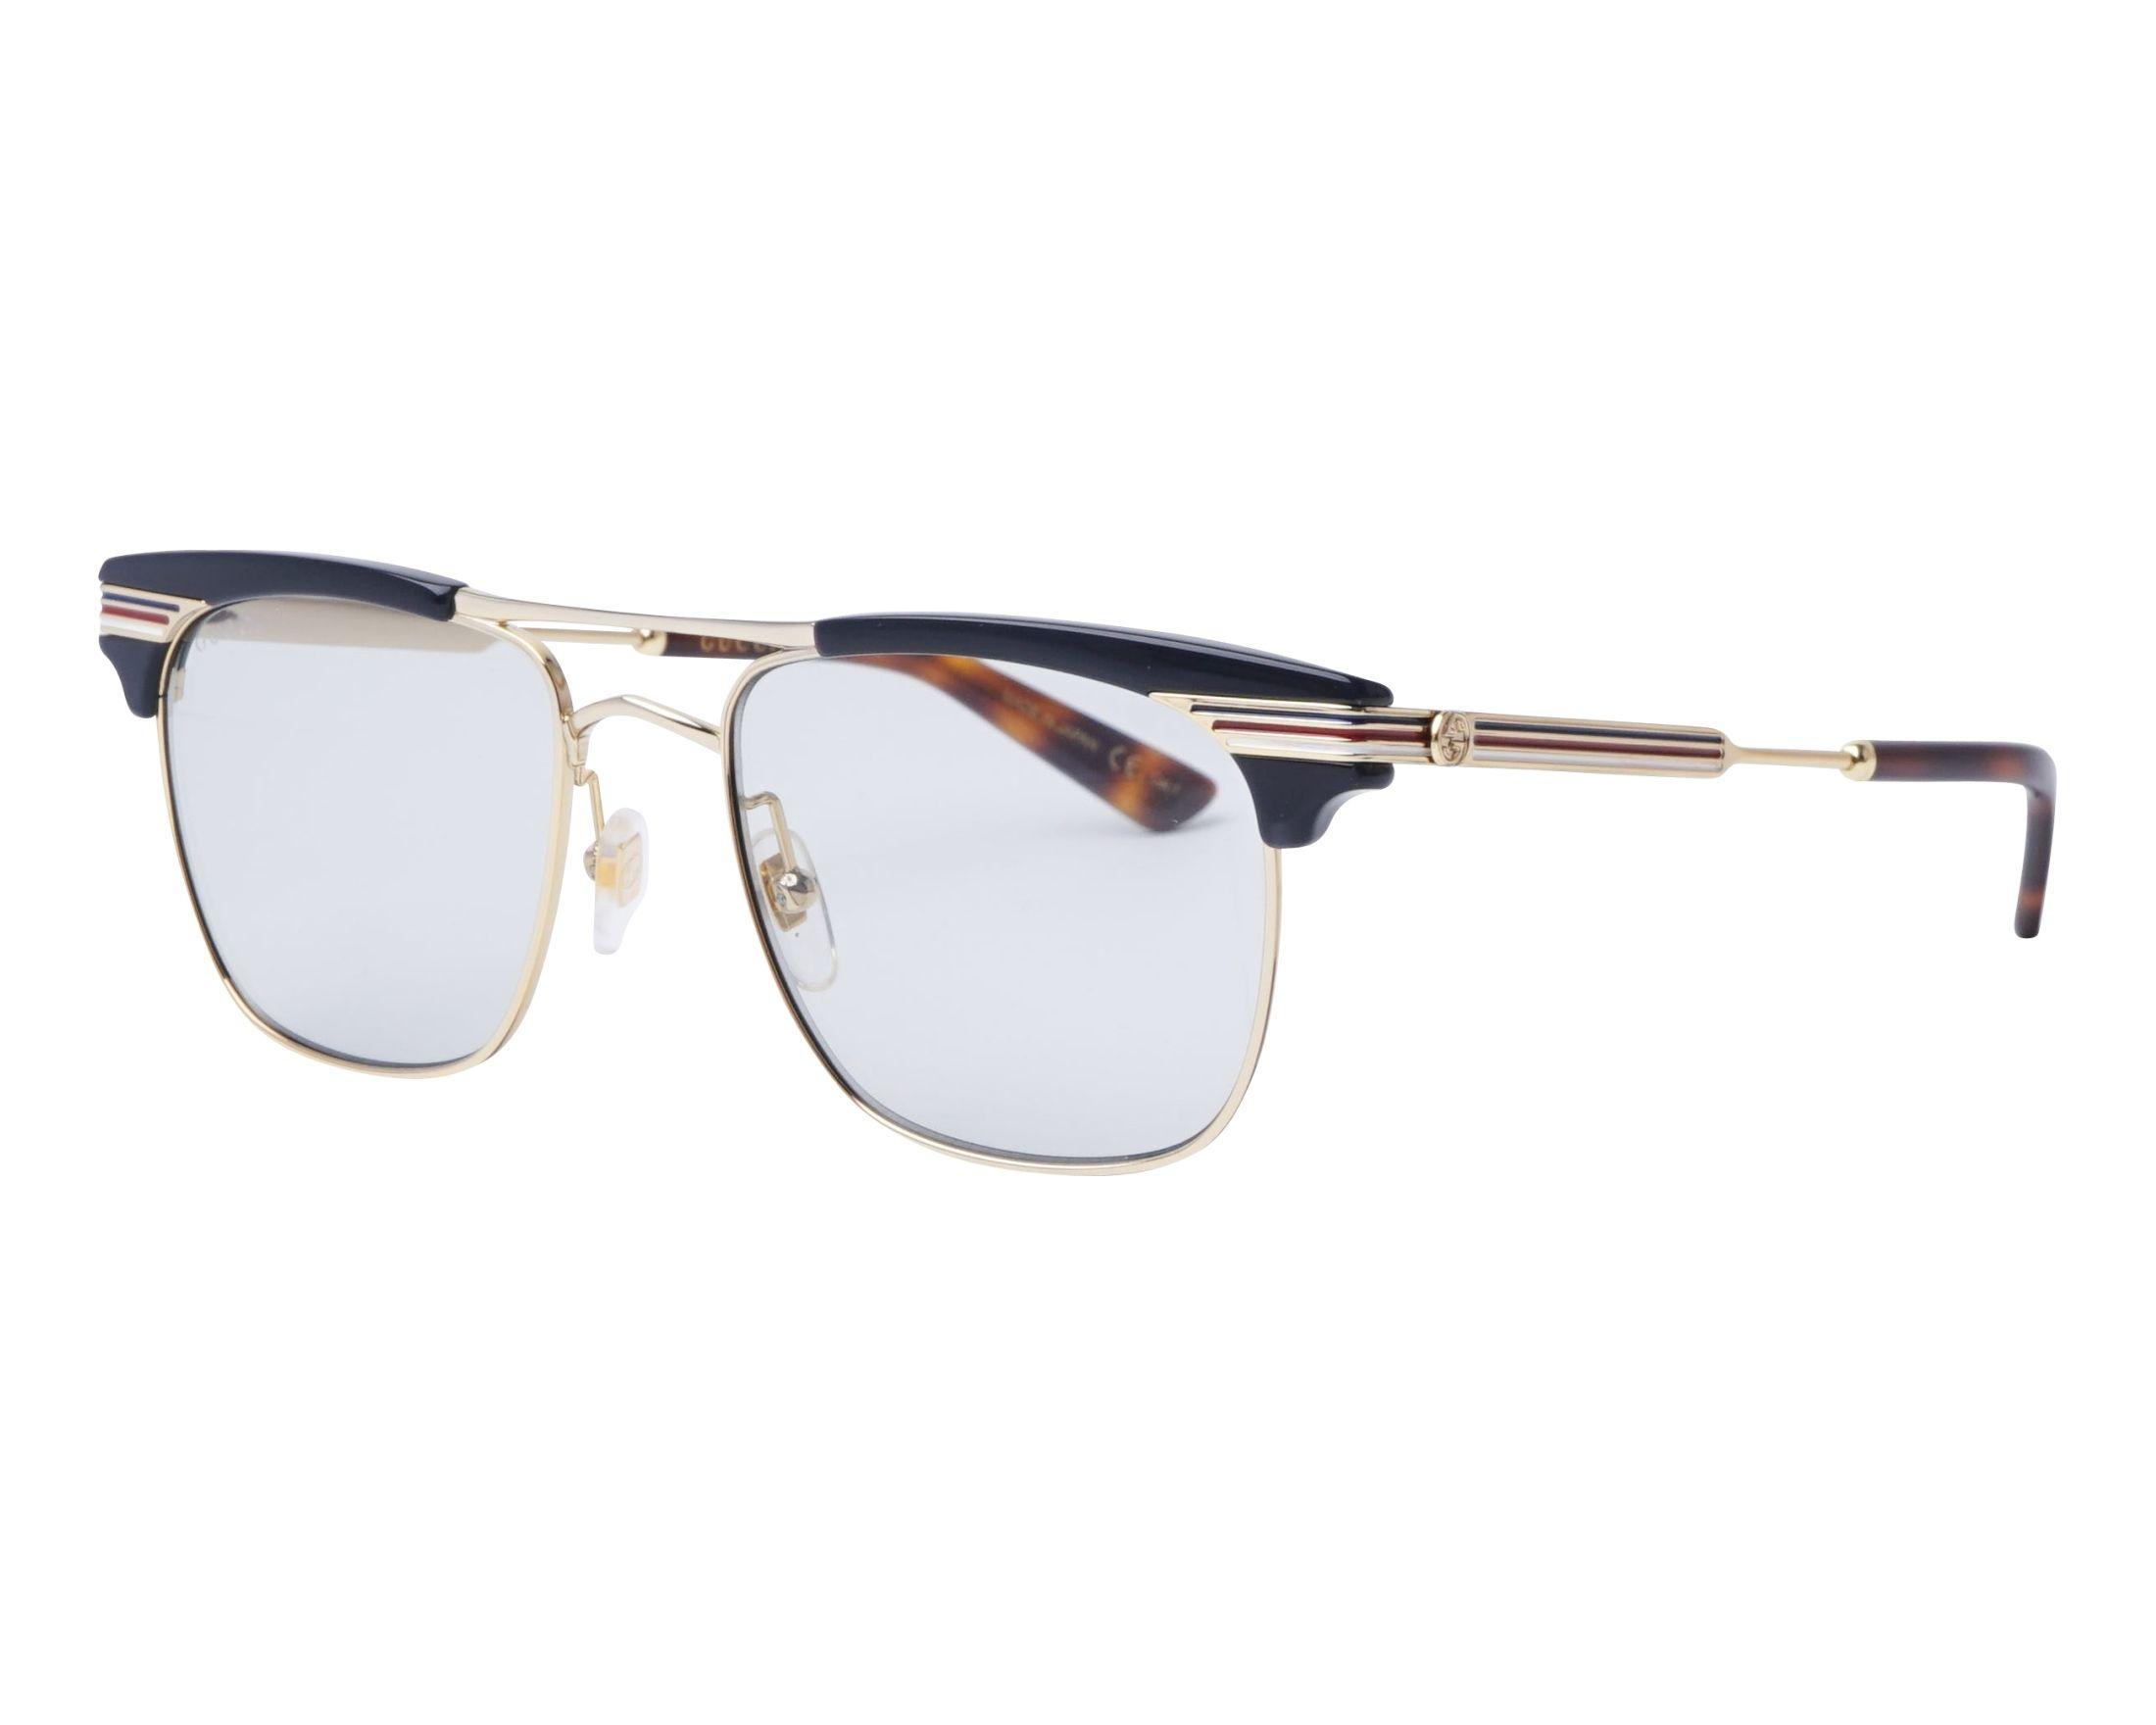 3538fc97908 eyeglasses Gucci GG-0287-S 006 52-18 Gold Blue profile view